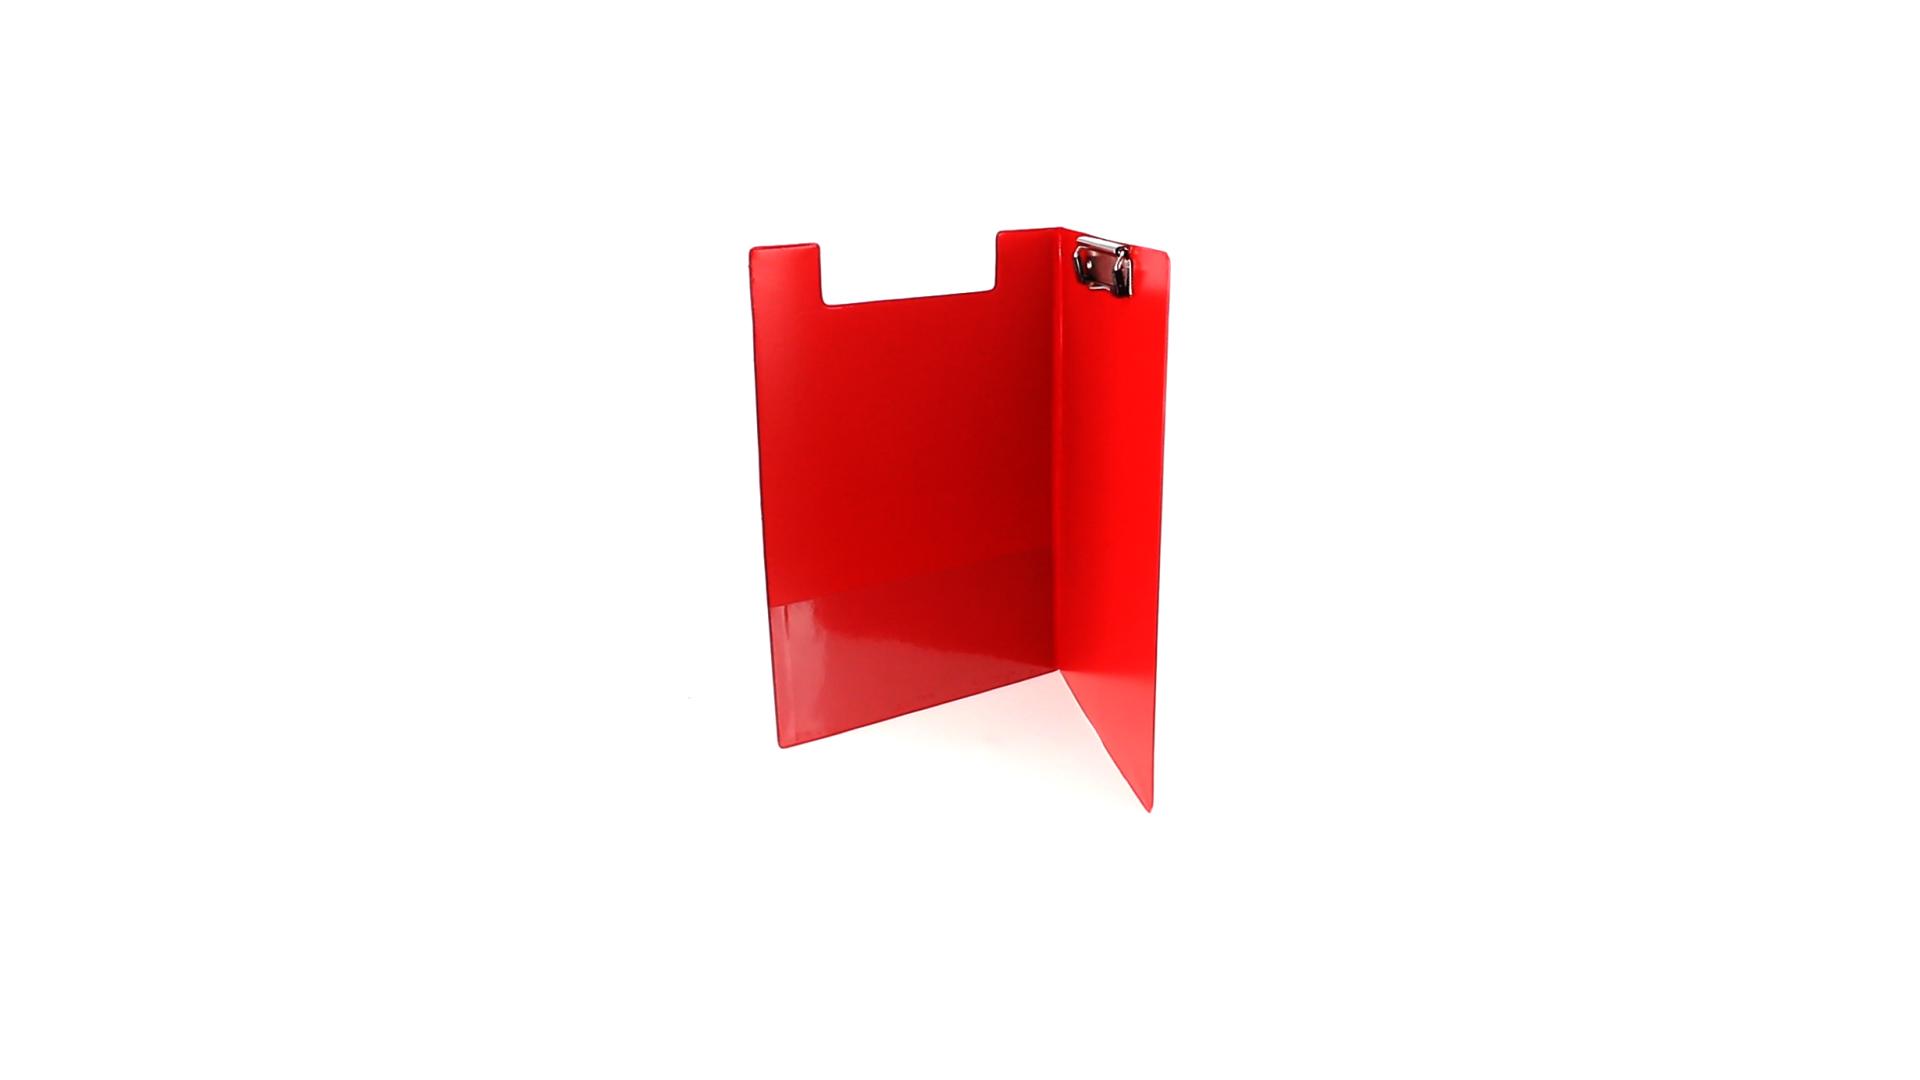 Carpeta Pvc con clik rojo interior